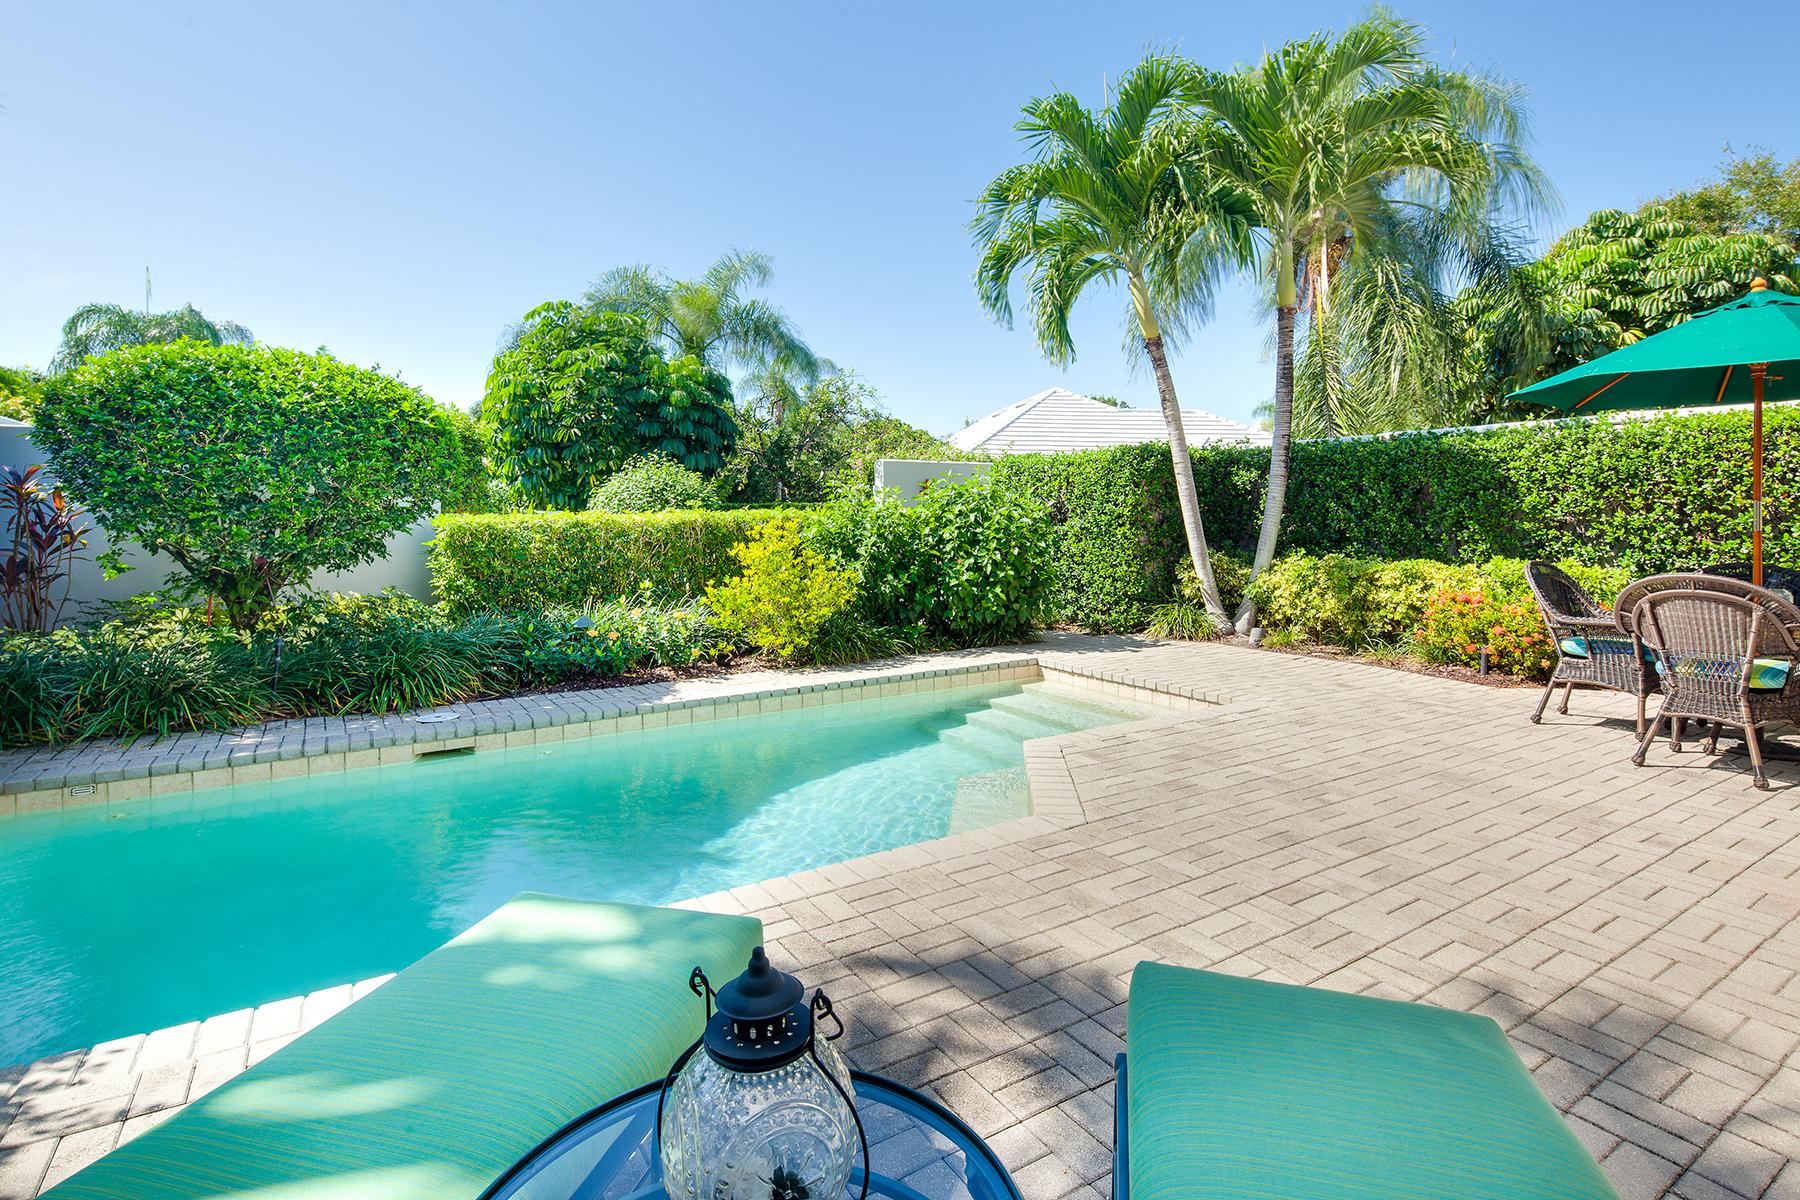 Property For Sale at 7089 Villa Lantana Way , 3.20, Naples, FL 34108